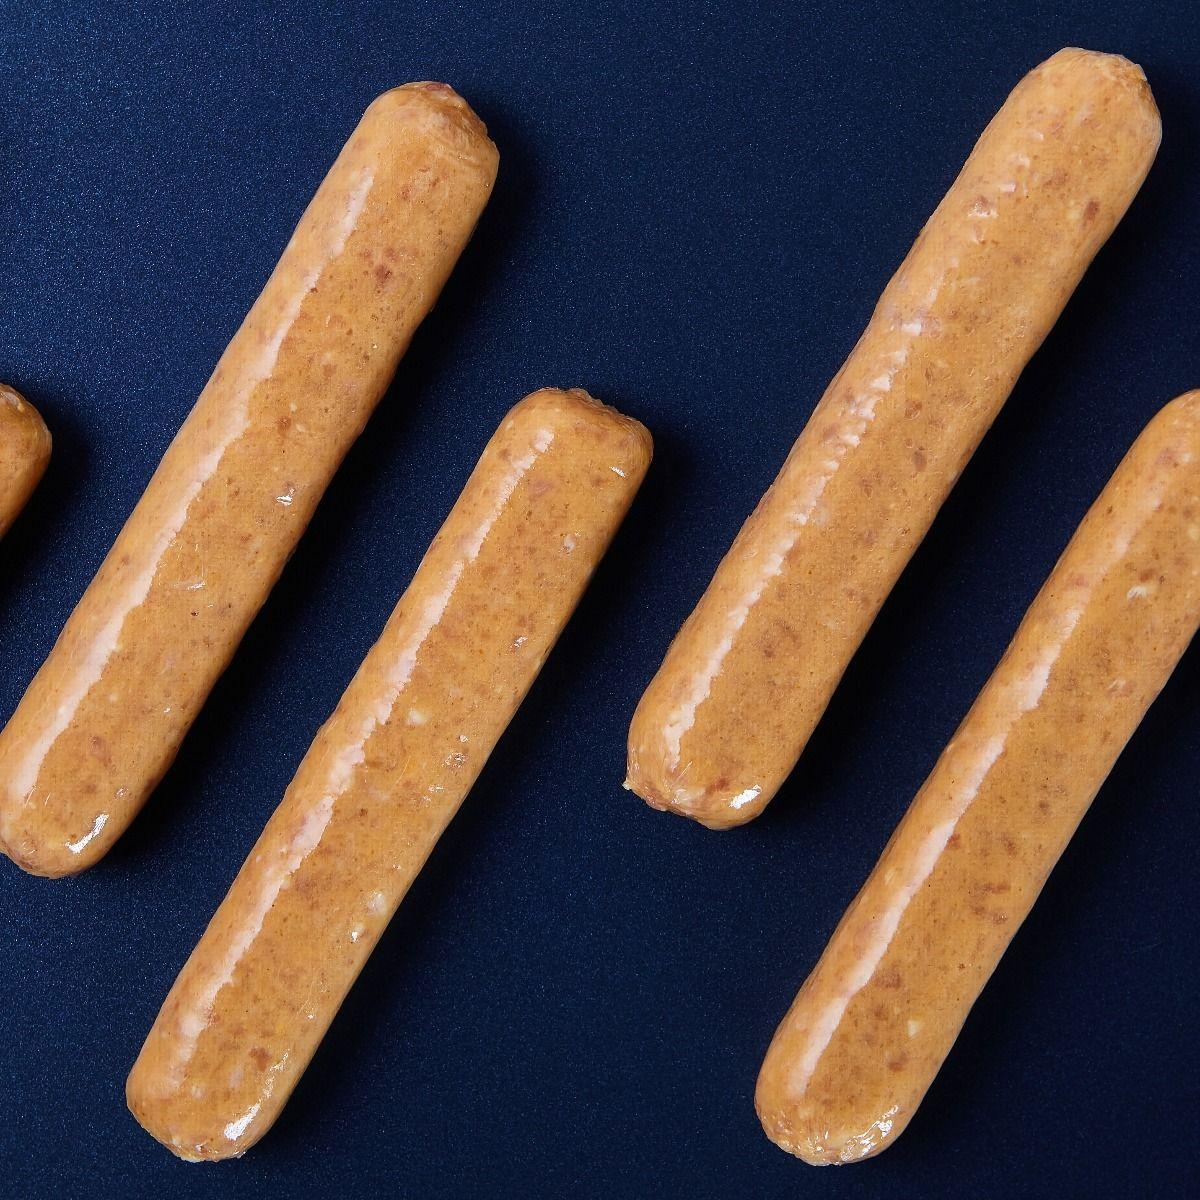 Turkey breakfast sausages, preserved (16/lb)